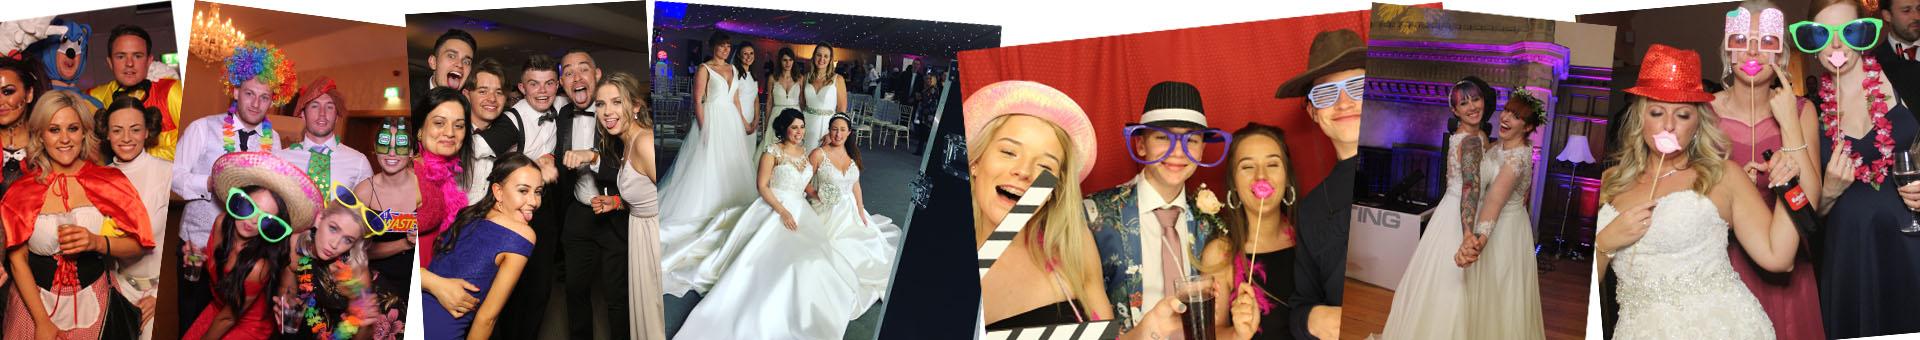 Brides at wedding with magic mirror photo booth hire in farnham